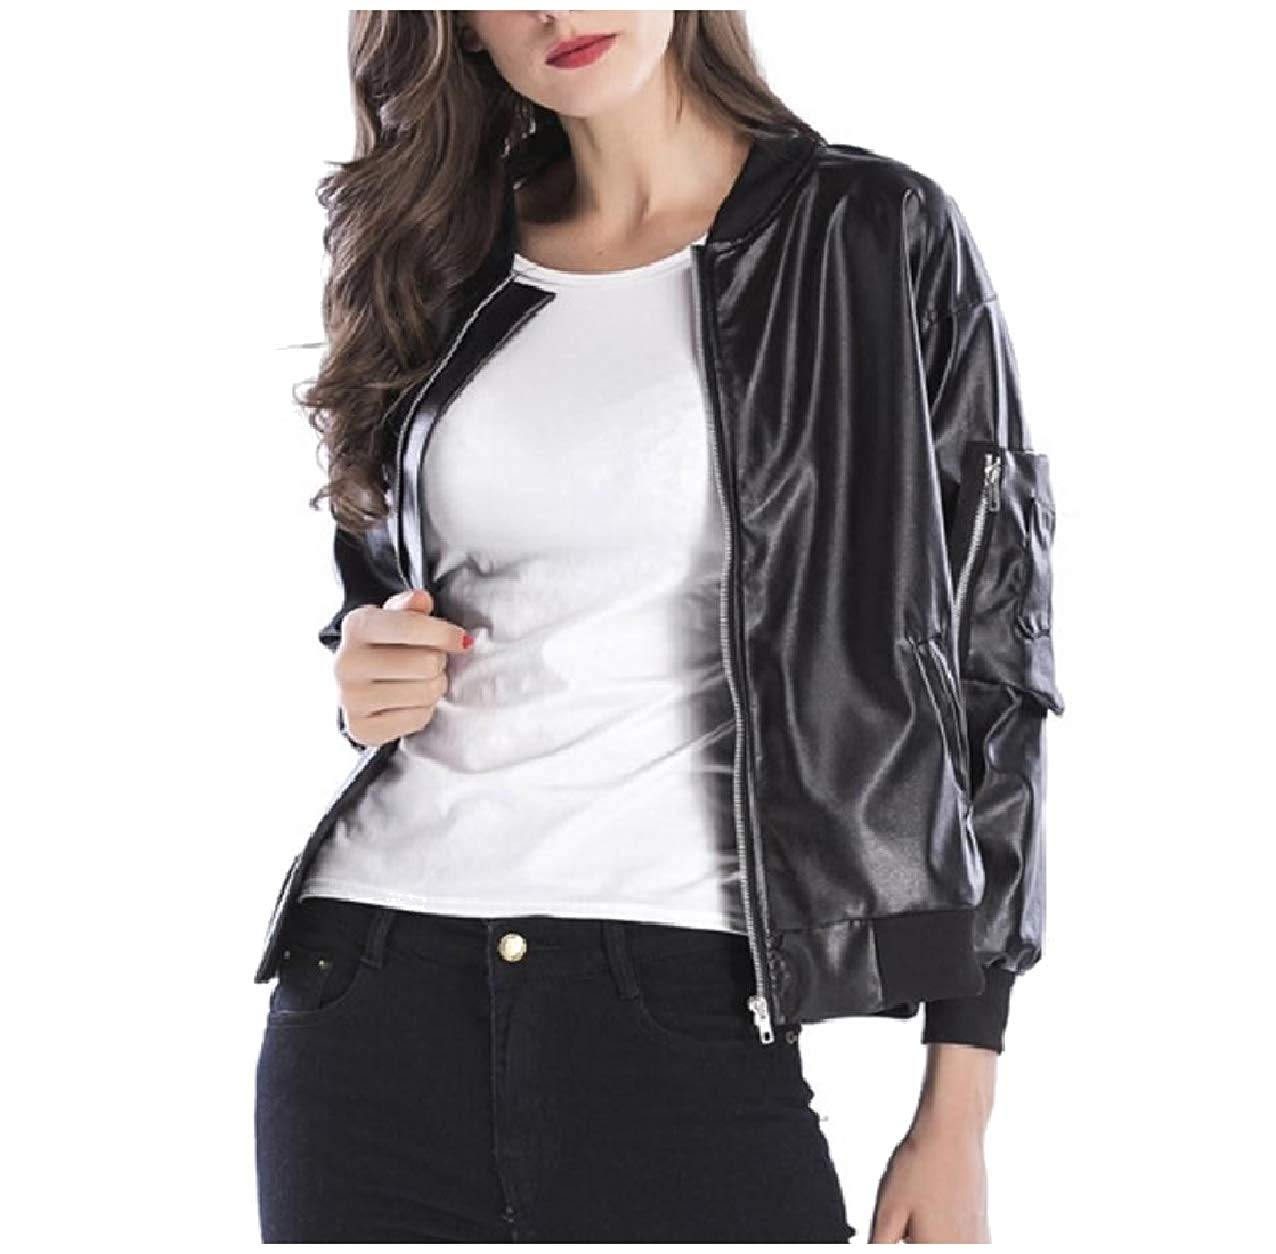 Zimaes-Women Outwear Stand-up Collar Zipper Faux-Leather Coat Jacket